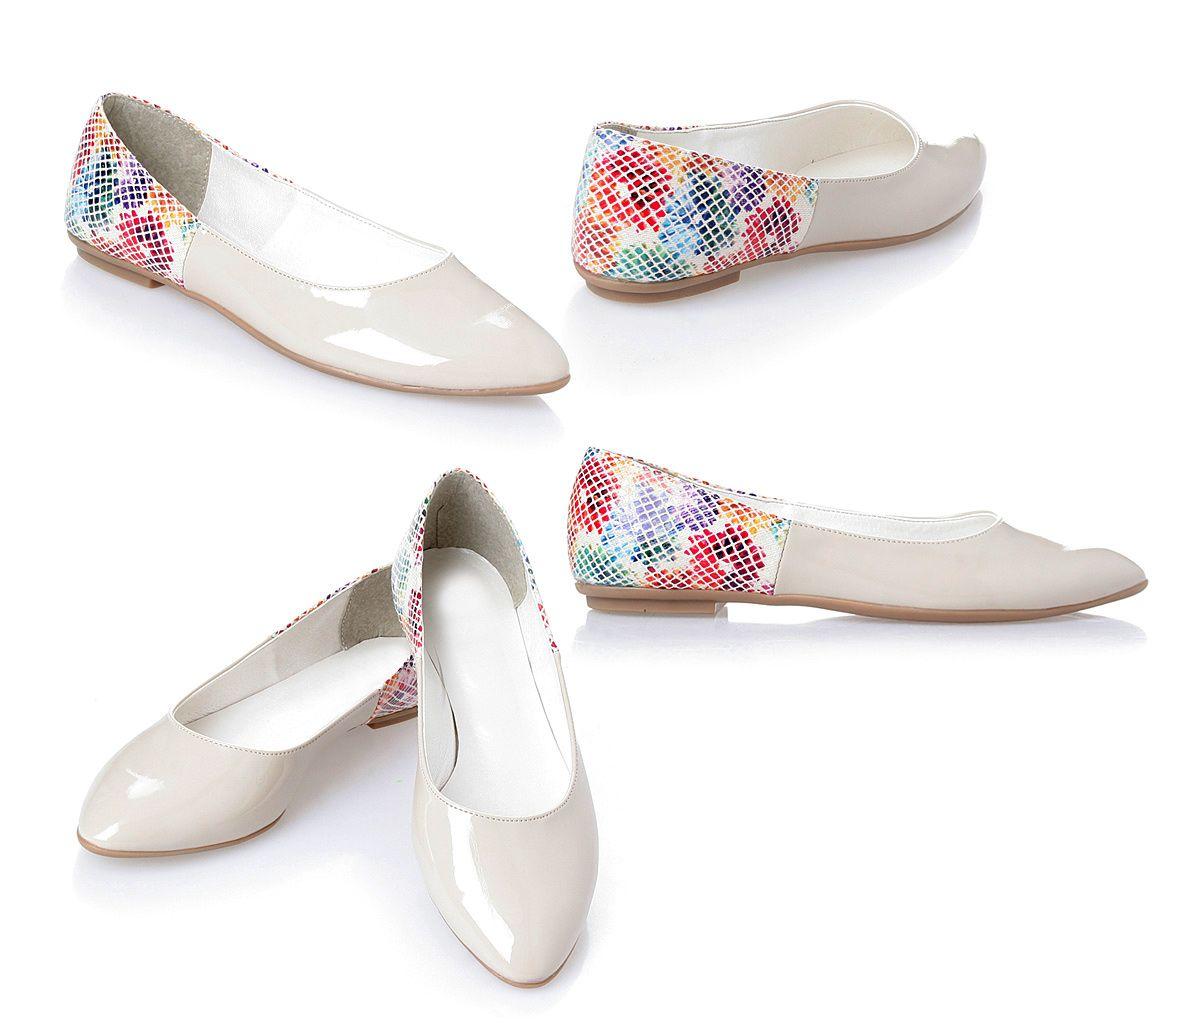 Balerinki Wkladka Skora Bezowe Lakier R 36 40 6093424868 Oficjalne Archiwum Allegro Shoes Mule Shoe Slippers